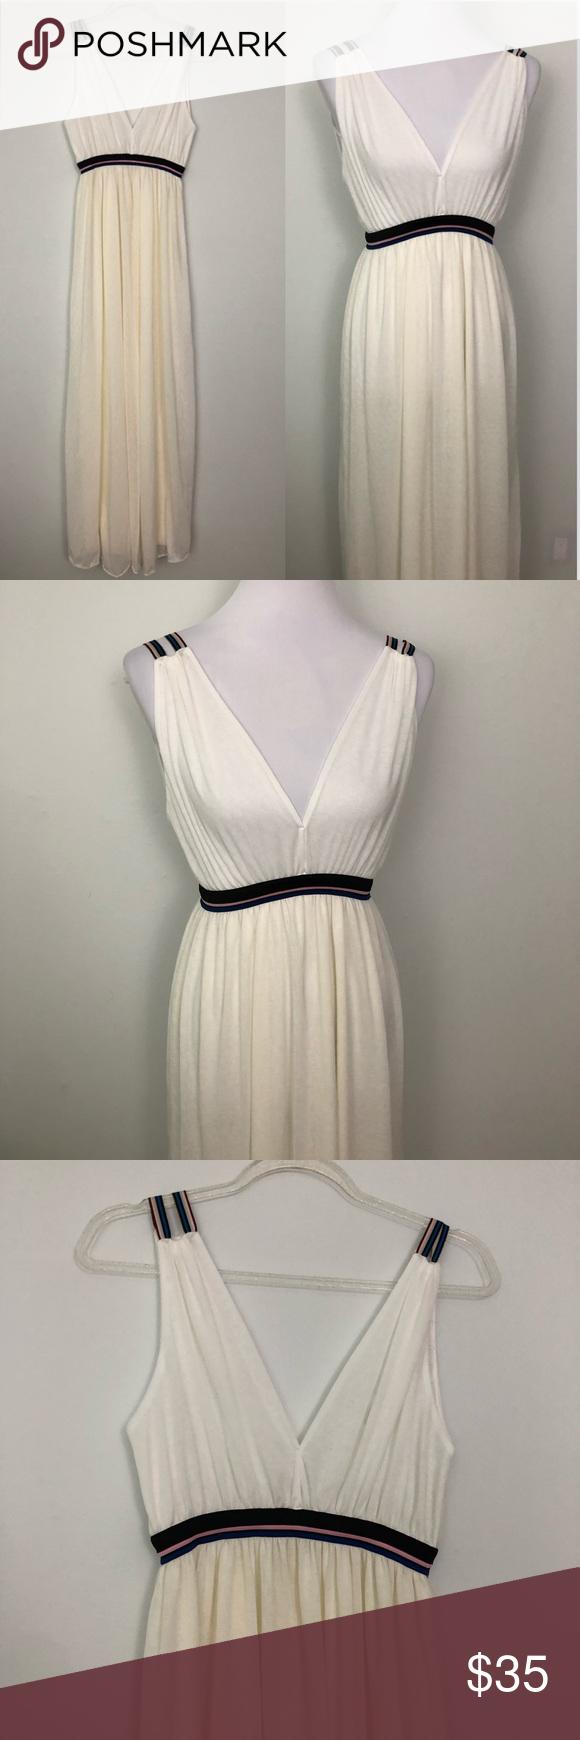 Zara Floor Length Goddess Maxi Dress White Stretch Goddess Maxi Dress White Maxi Dresses Dresses [ 1740 x 580 Pixel ]